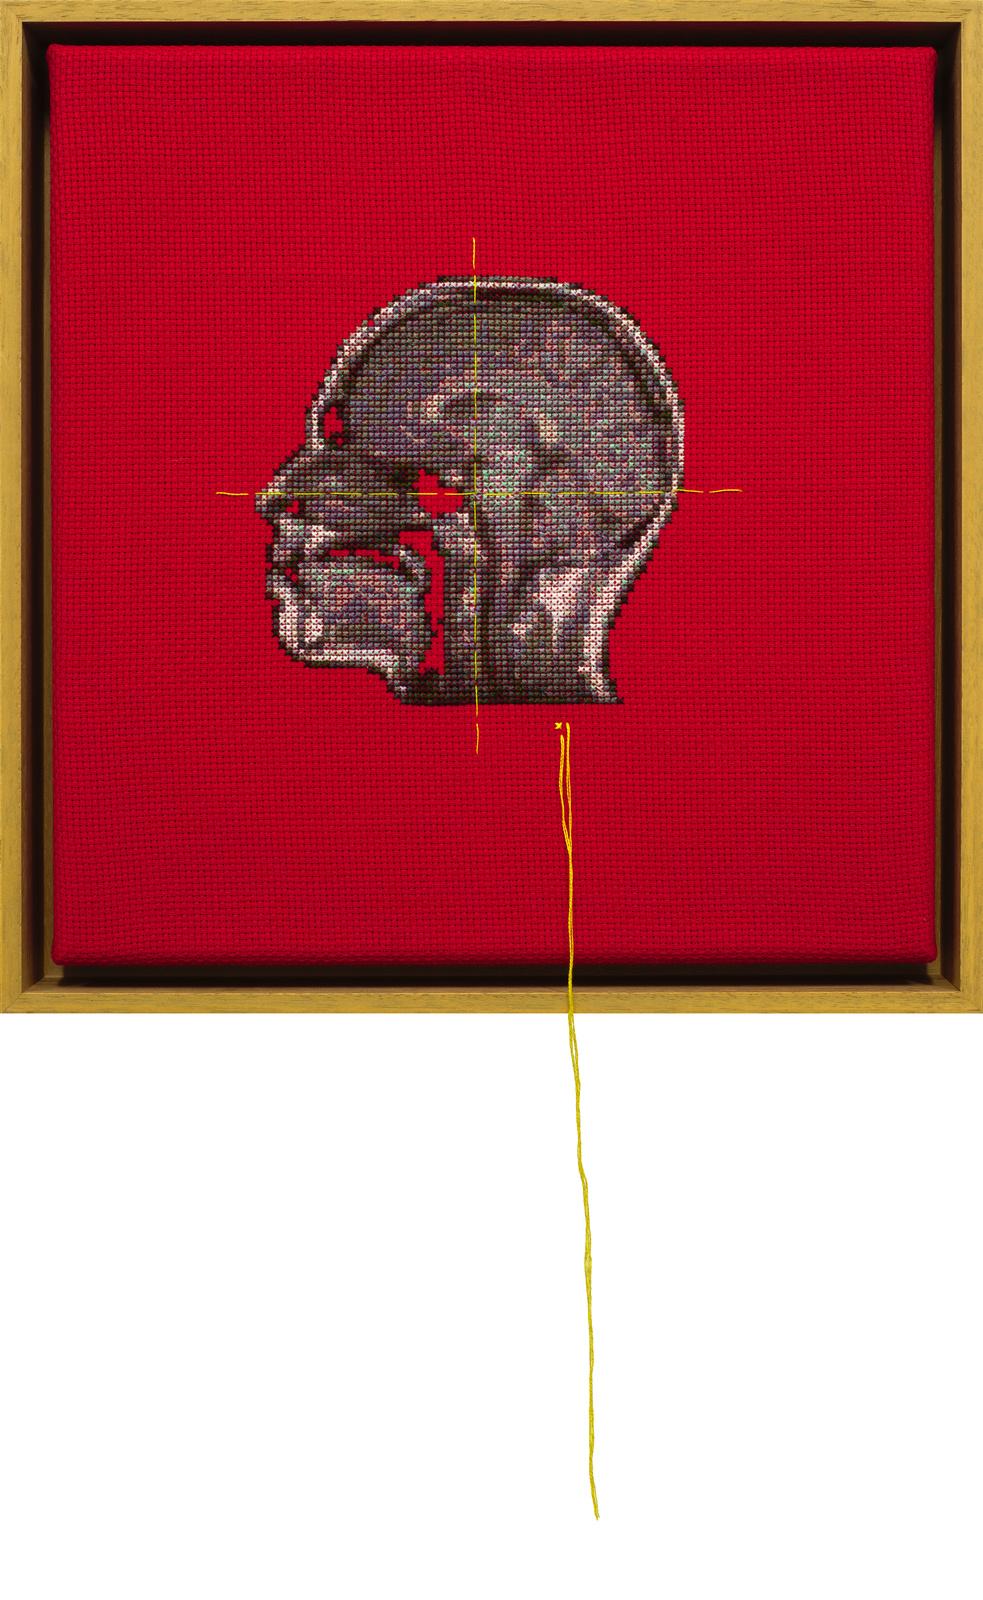 Lada Dedic Self Portrait; Artist's Brain Stranded cotton on aida cloth, 2015 300 x 290 mm  Stitching time: 43 hours    photo Bob Newman